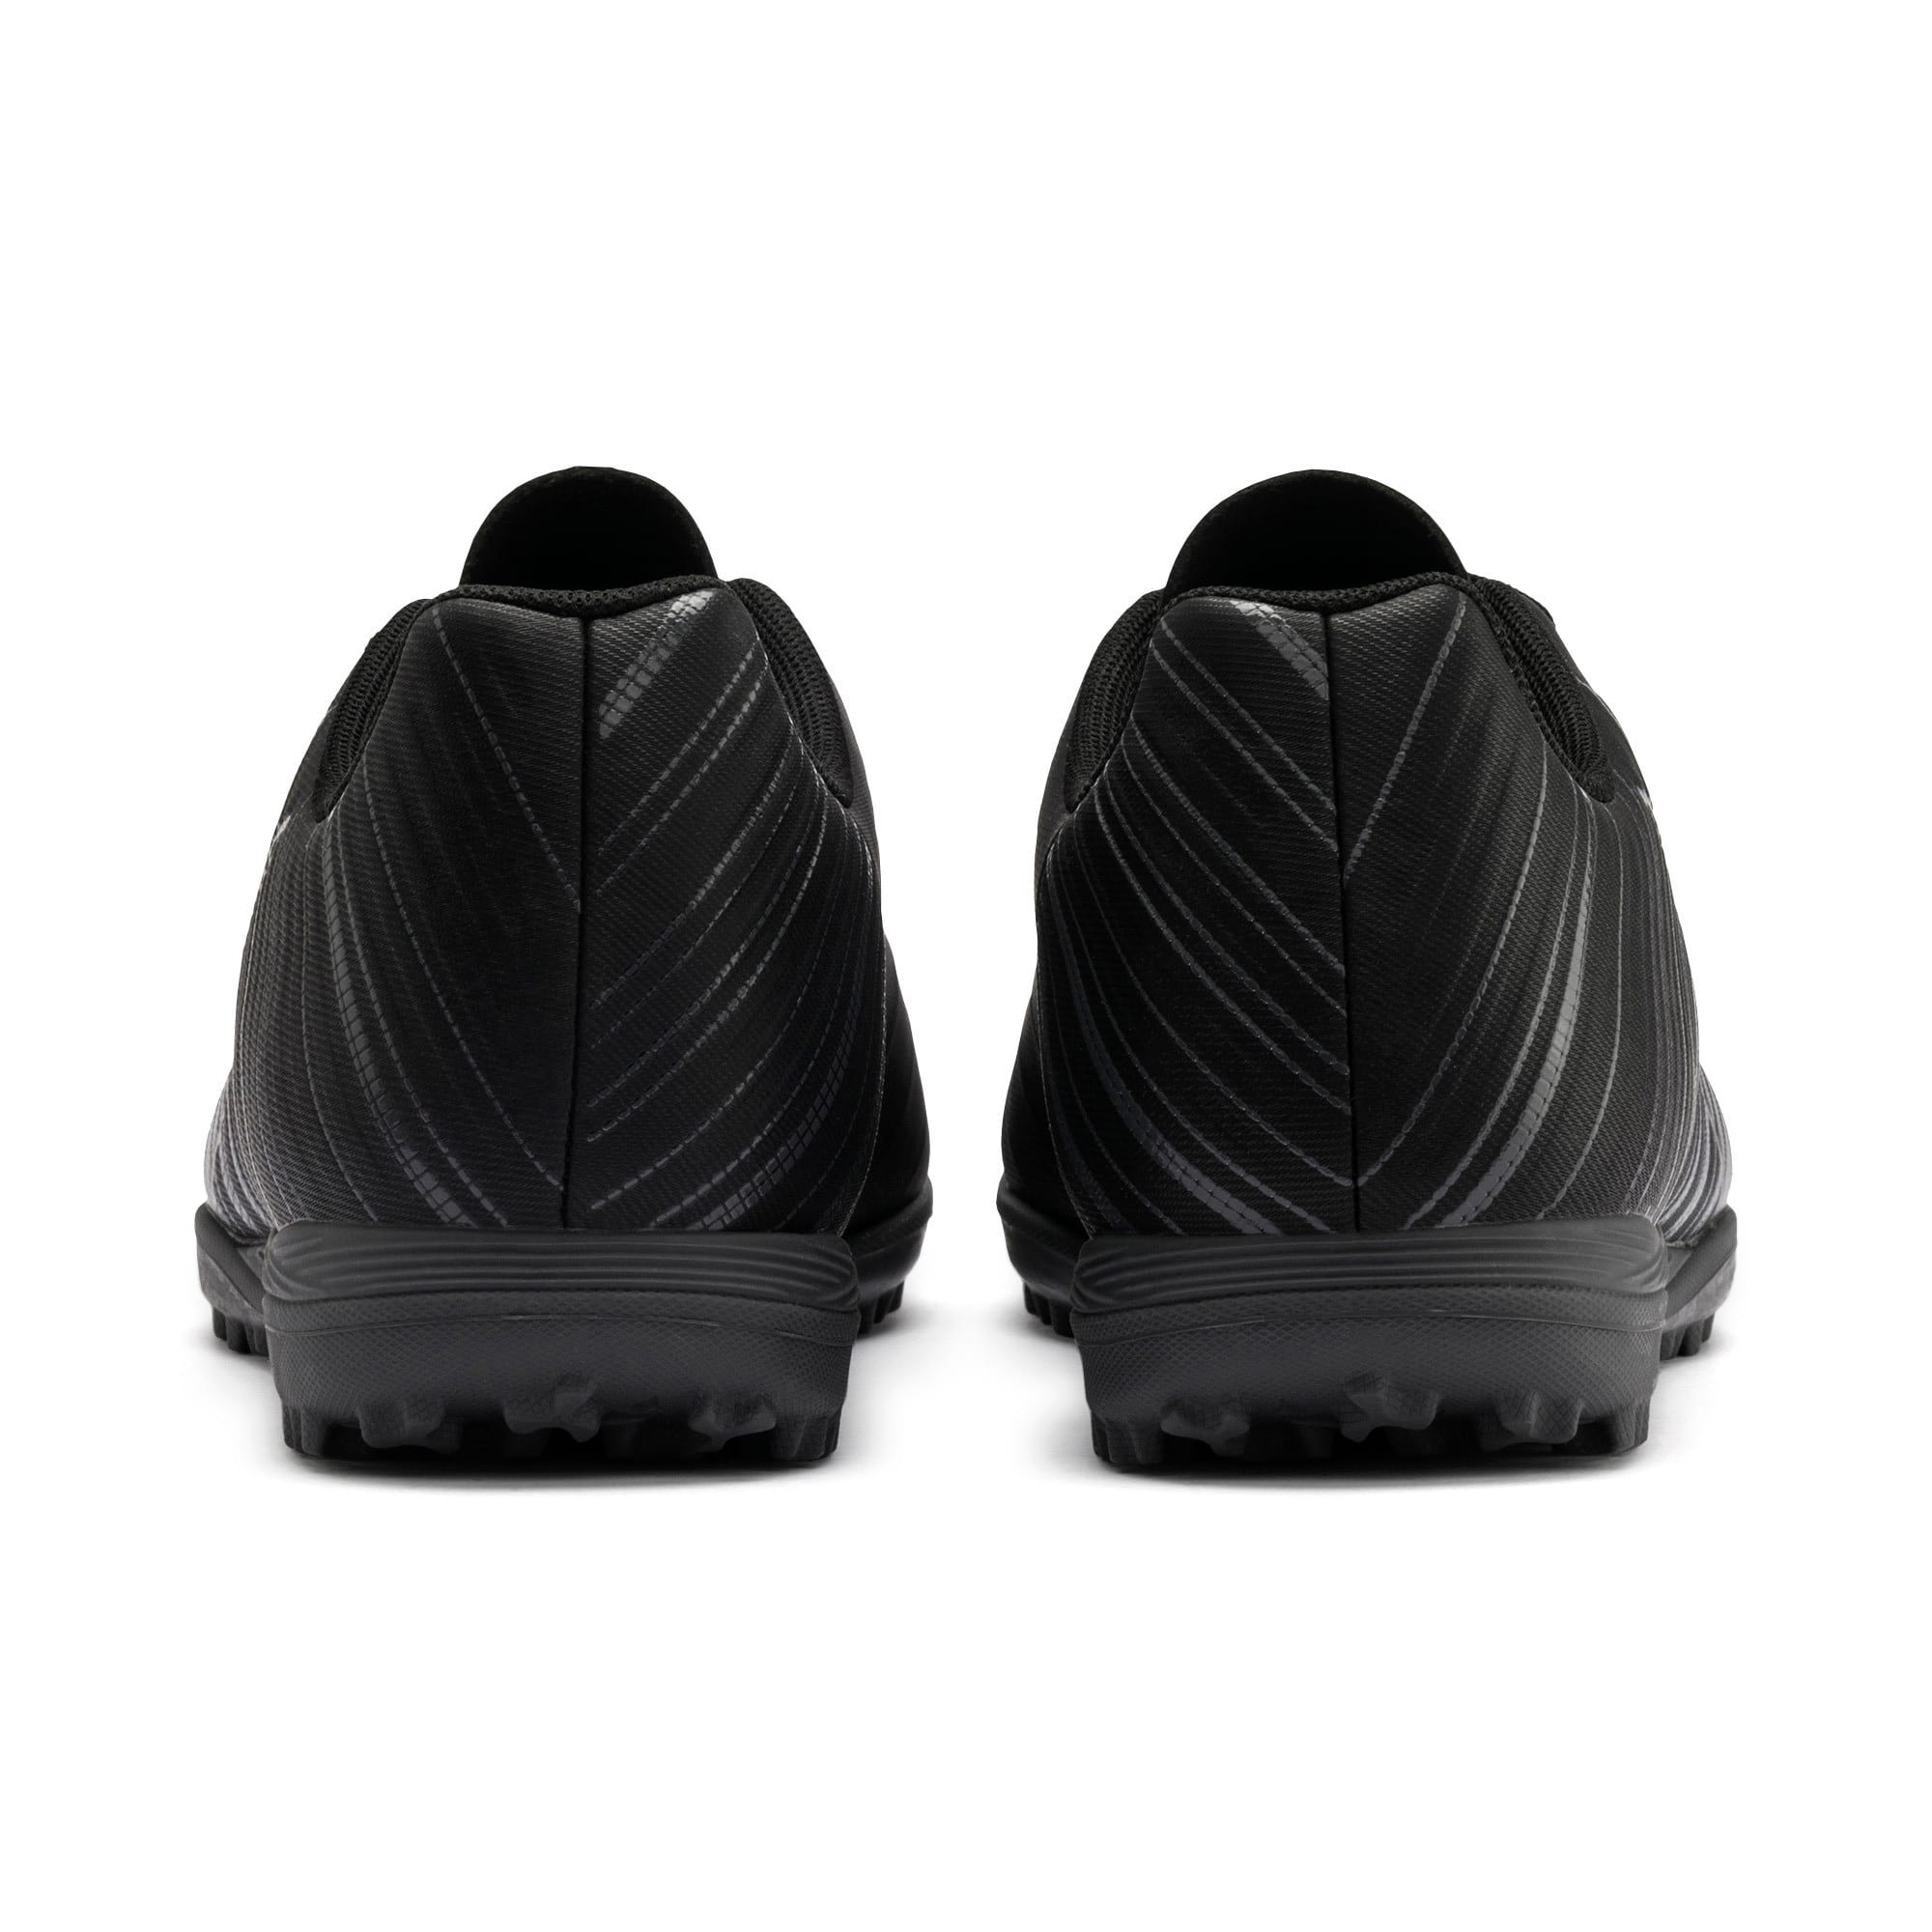 Thumbnail 4 of PUMA ONE 5.4 TT Men's Soccer Shoes, Black-Black-Puma Aged Silver, medium